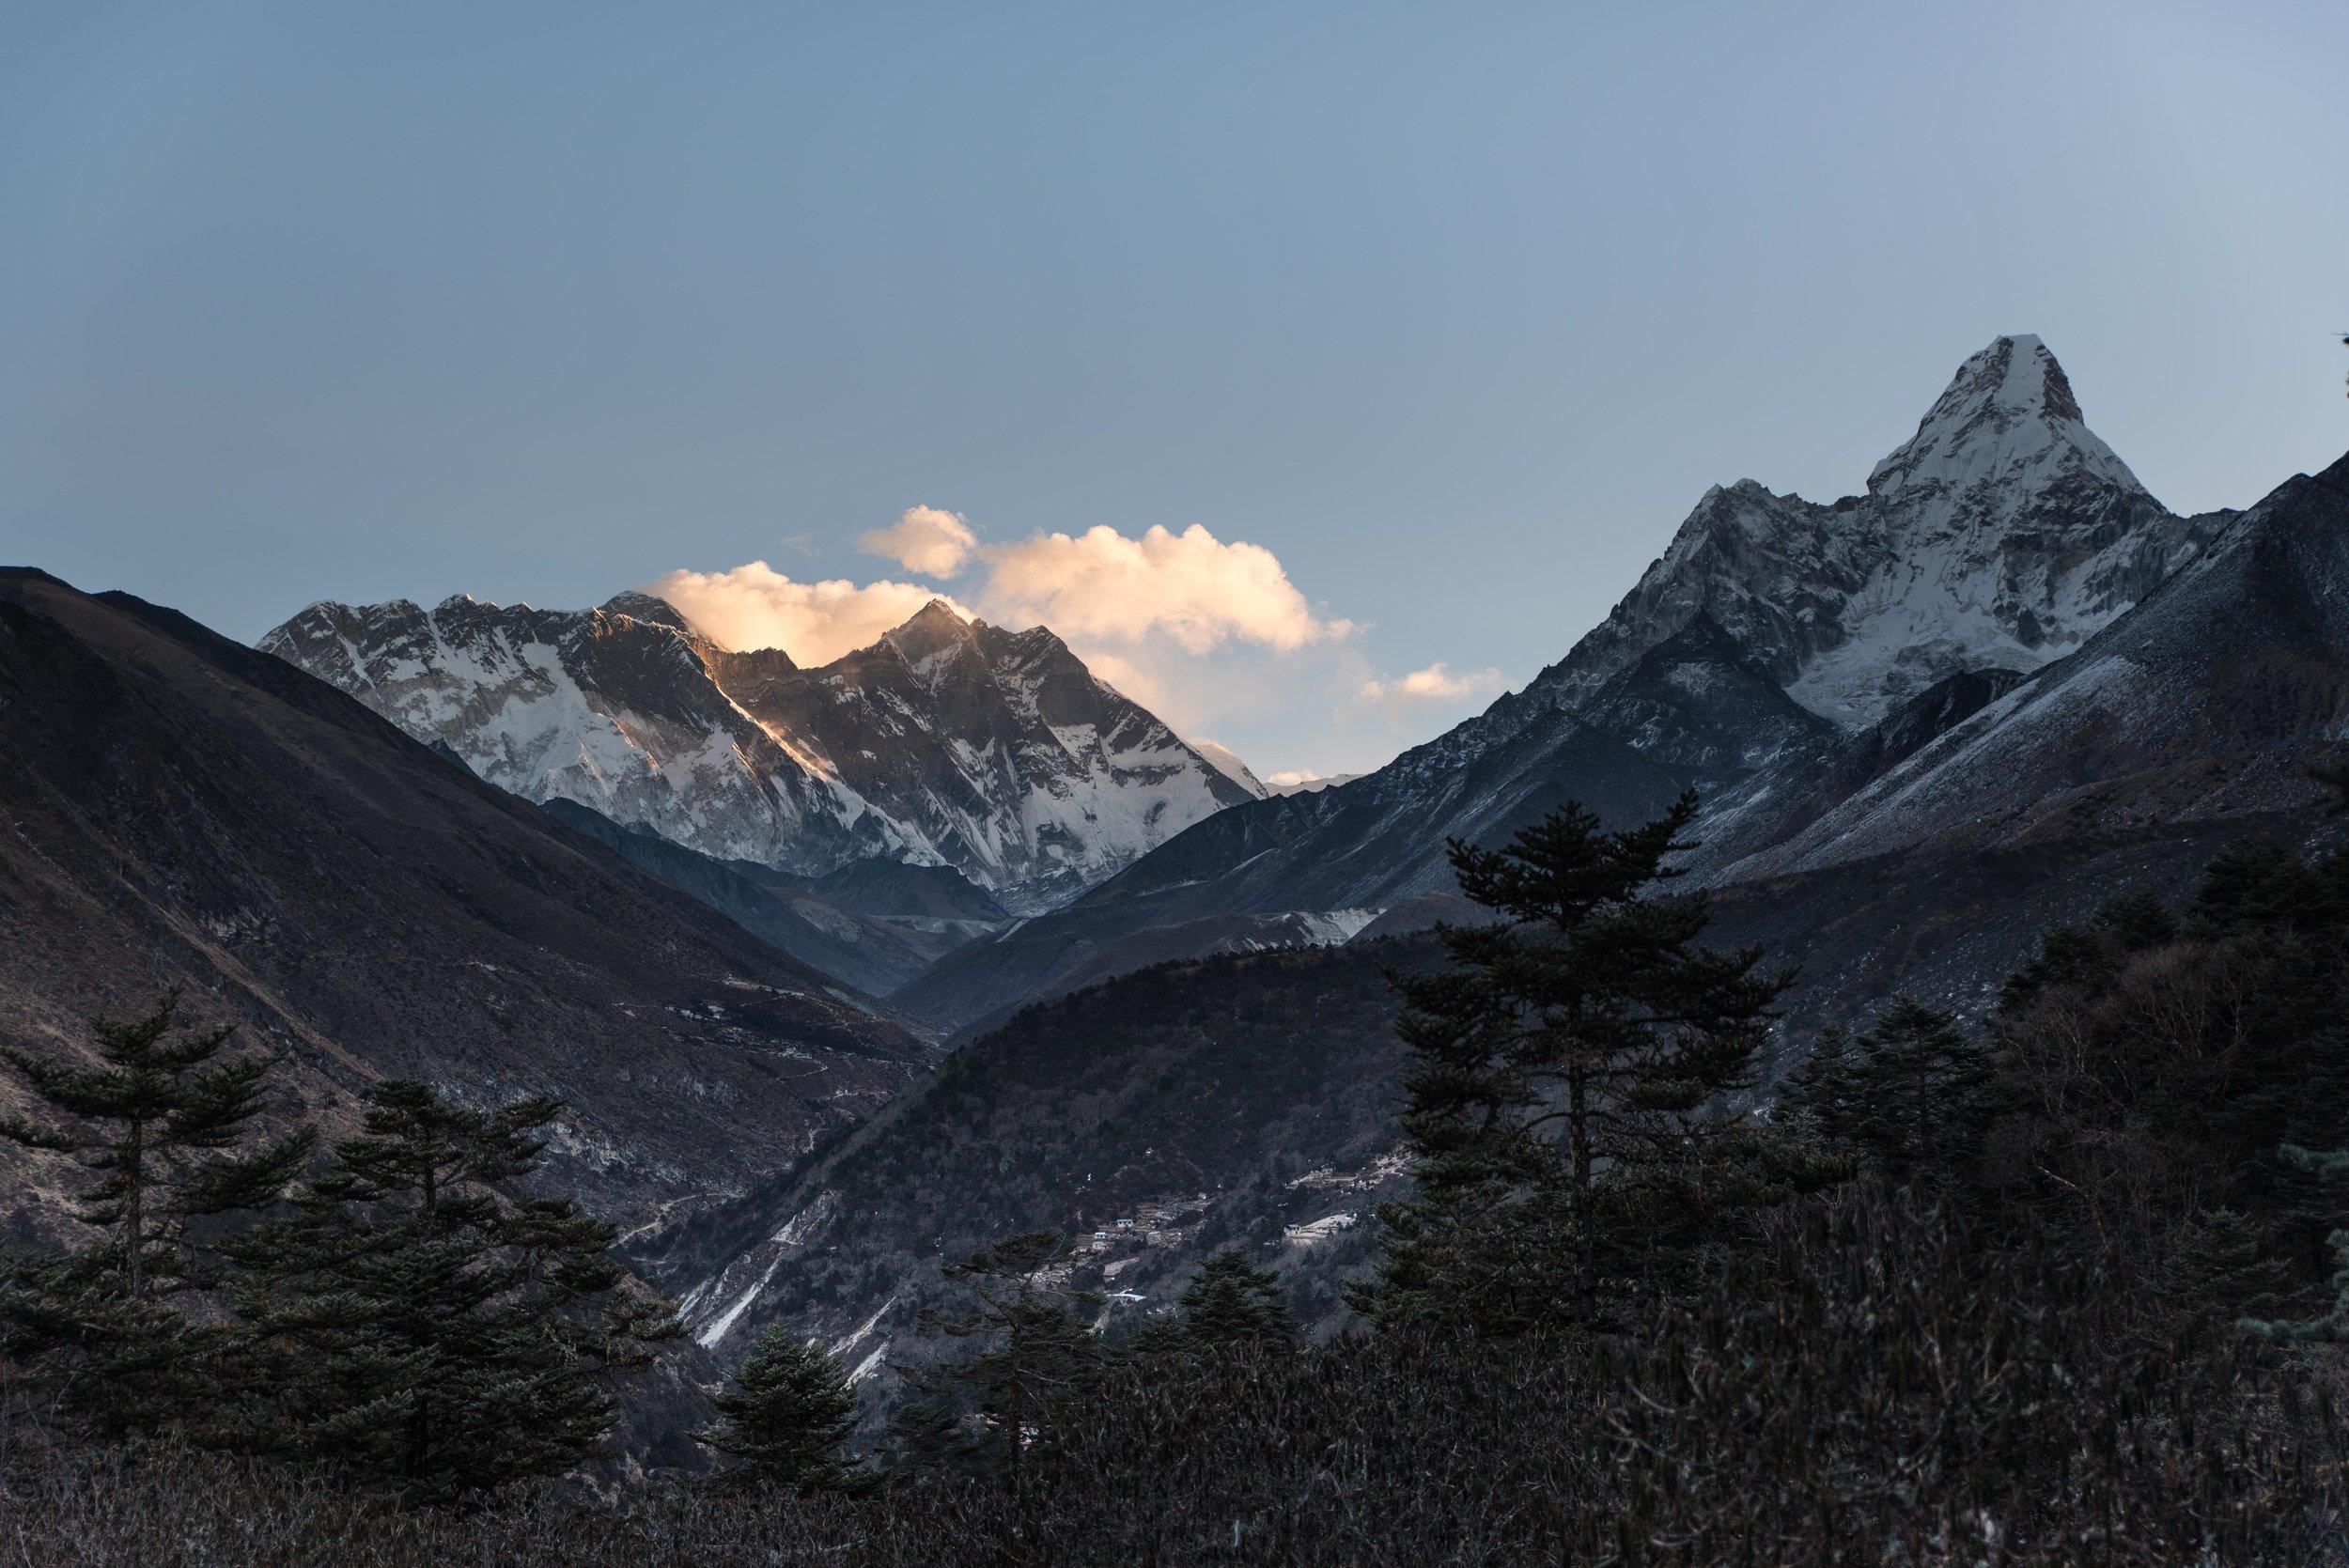 THISWORLDEXISTS Hiking the Himalaya Everest Trekking